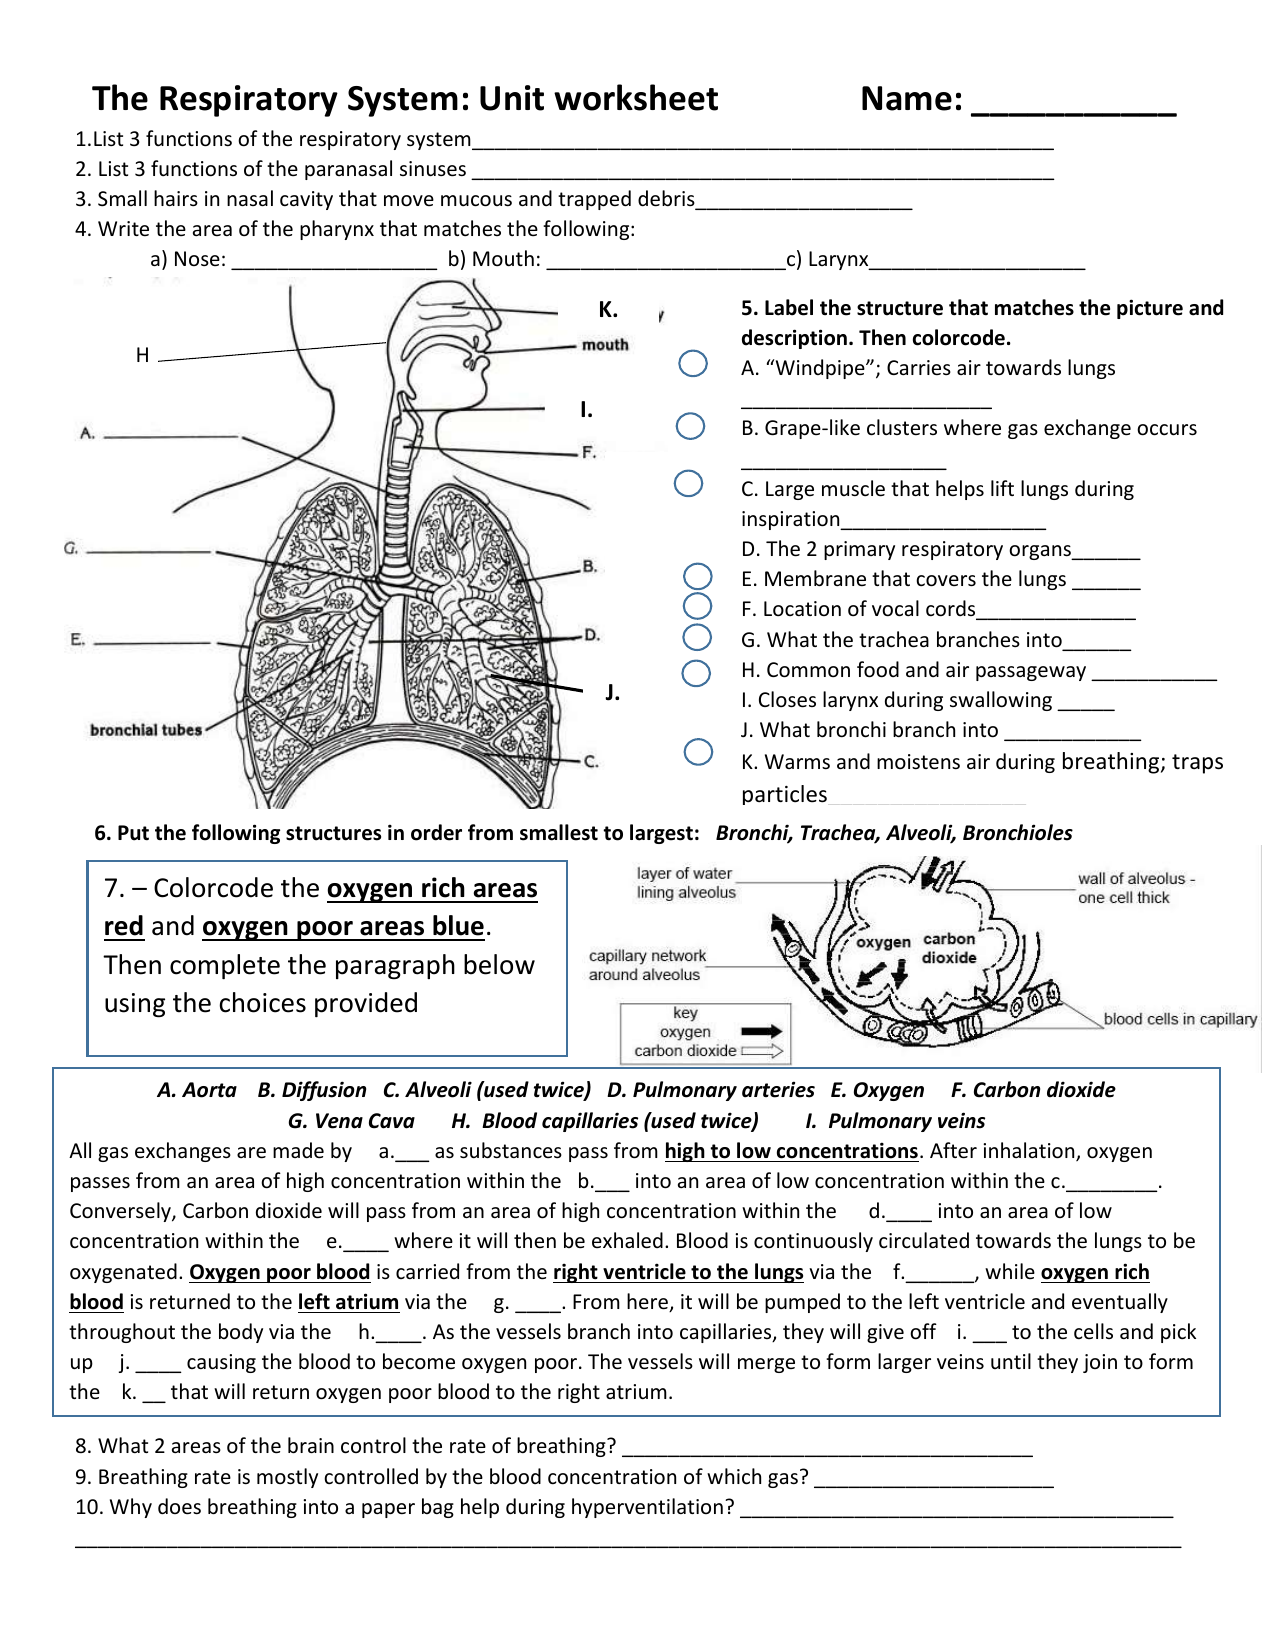 Respiratory Worksheet25 Throughout The Respiratory System Worksheet